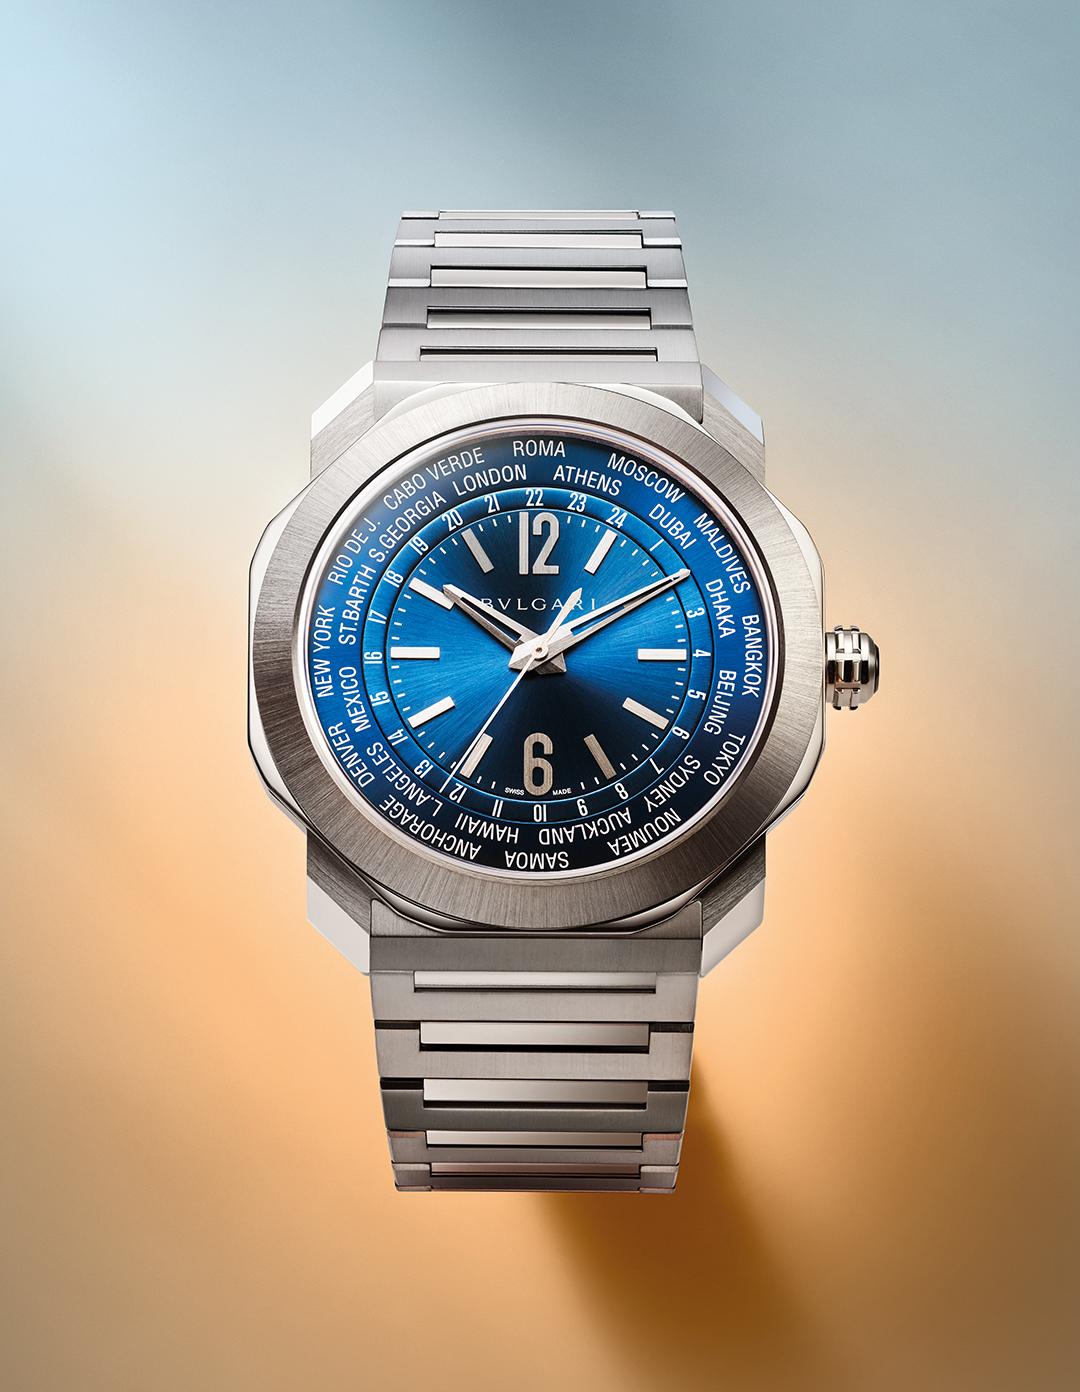 BVLGARI OCTO ROMA WORLDTIMER BLUE 103481